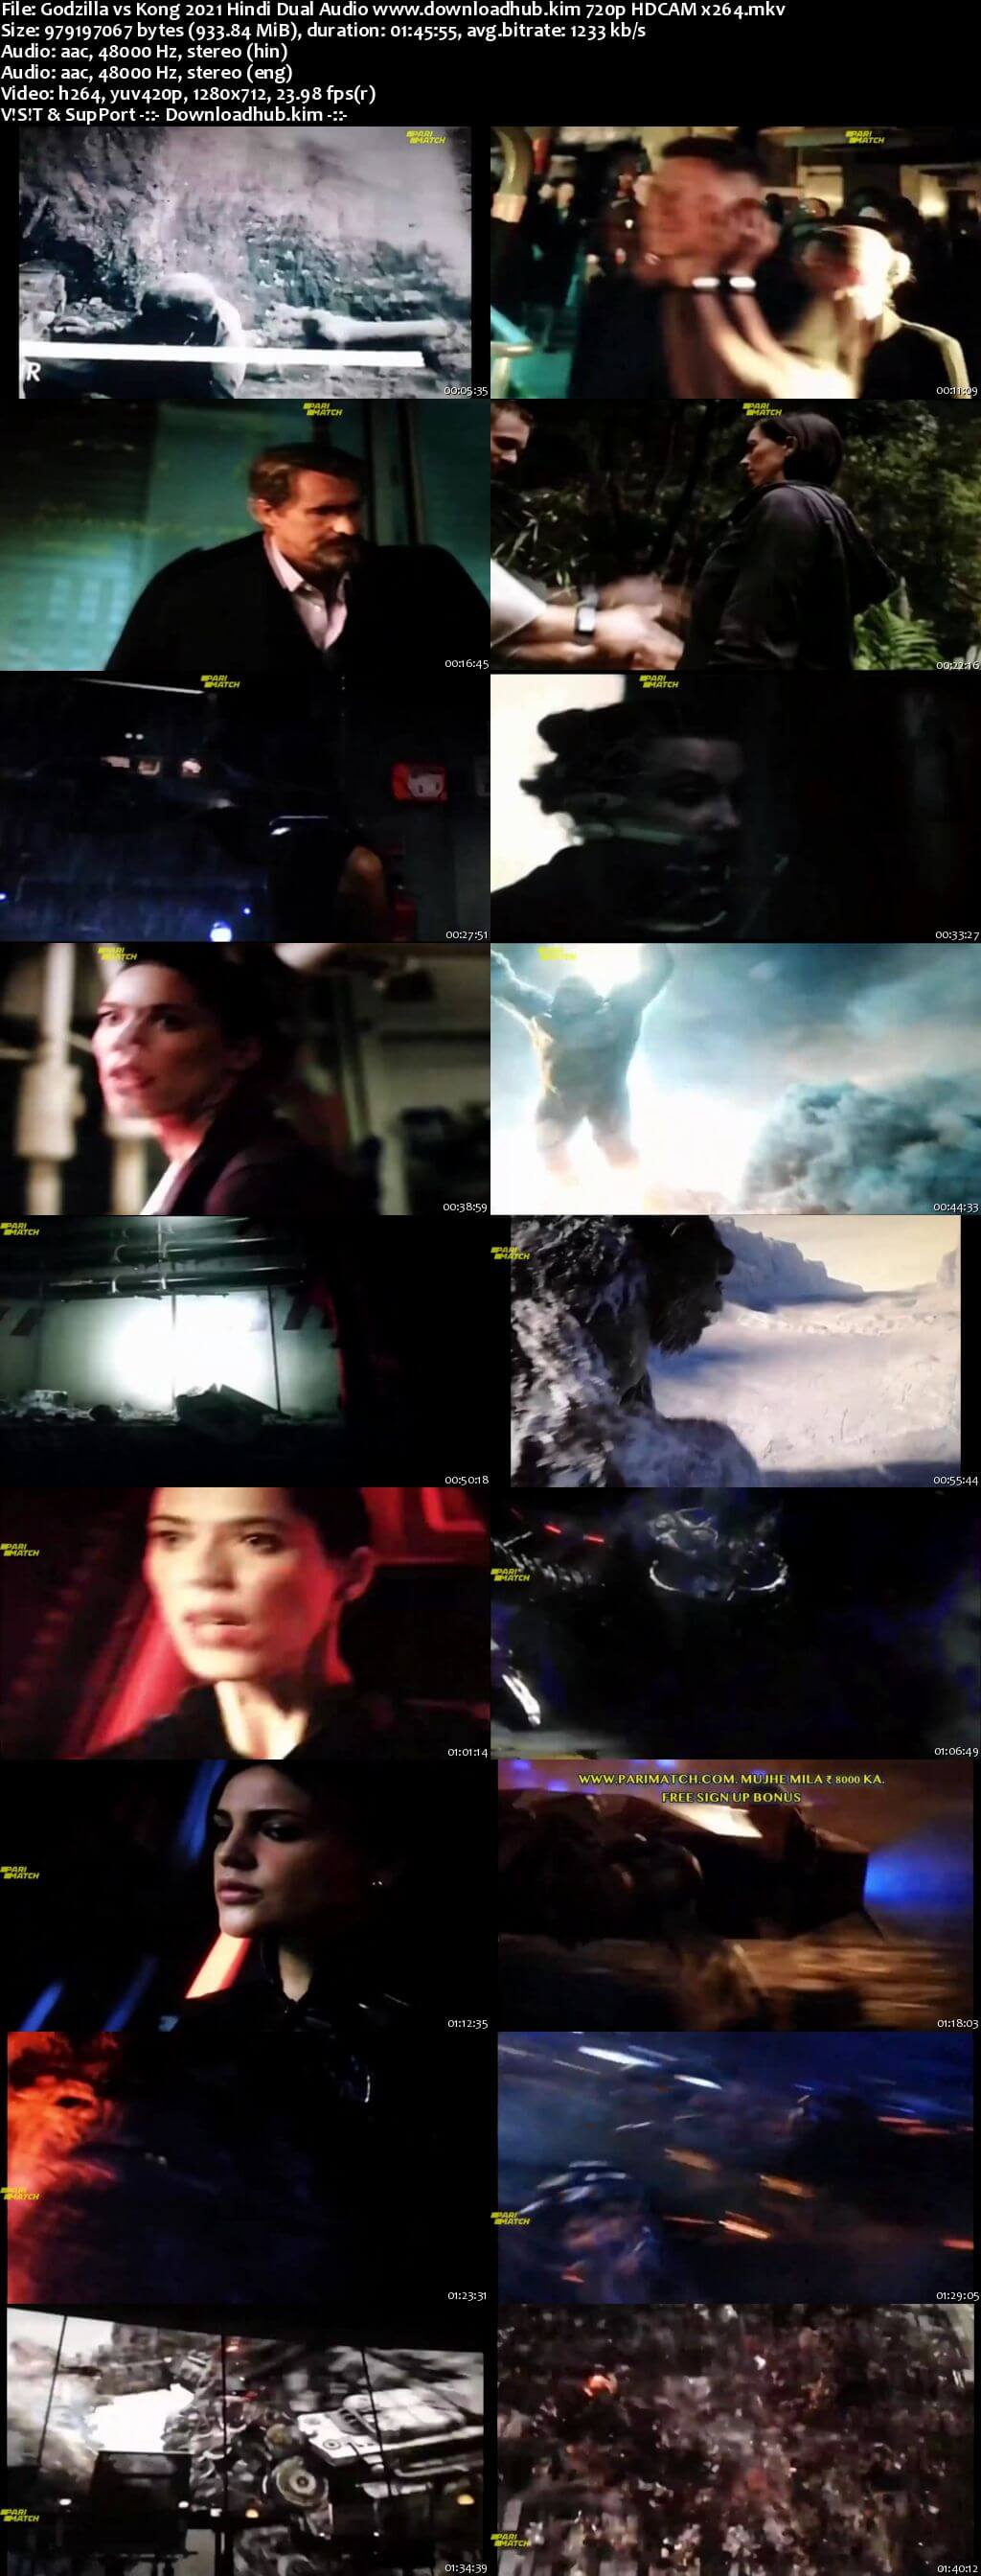 Godzilla vs Kong 2021 Hindi Dual Audio 720p HDCAM x264